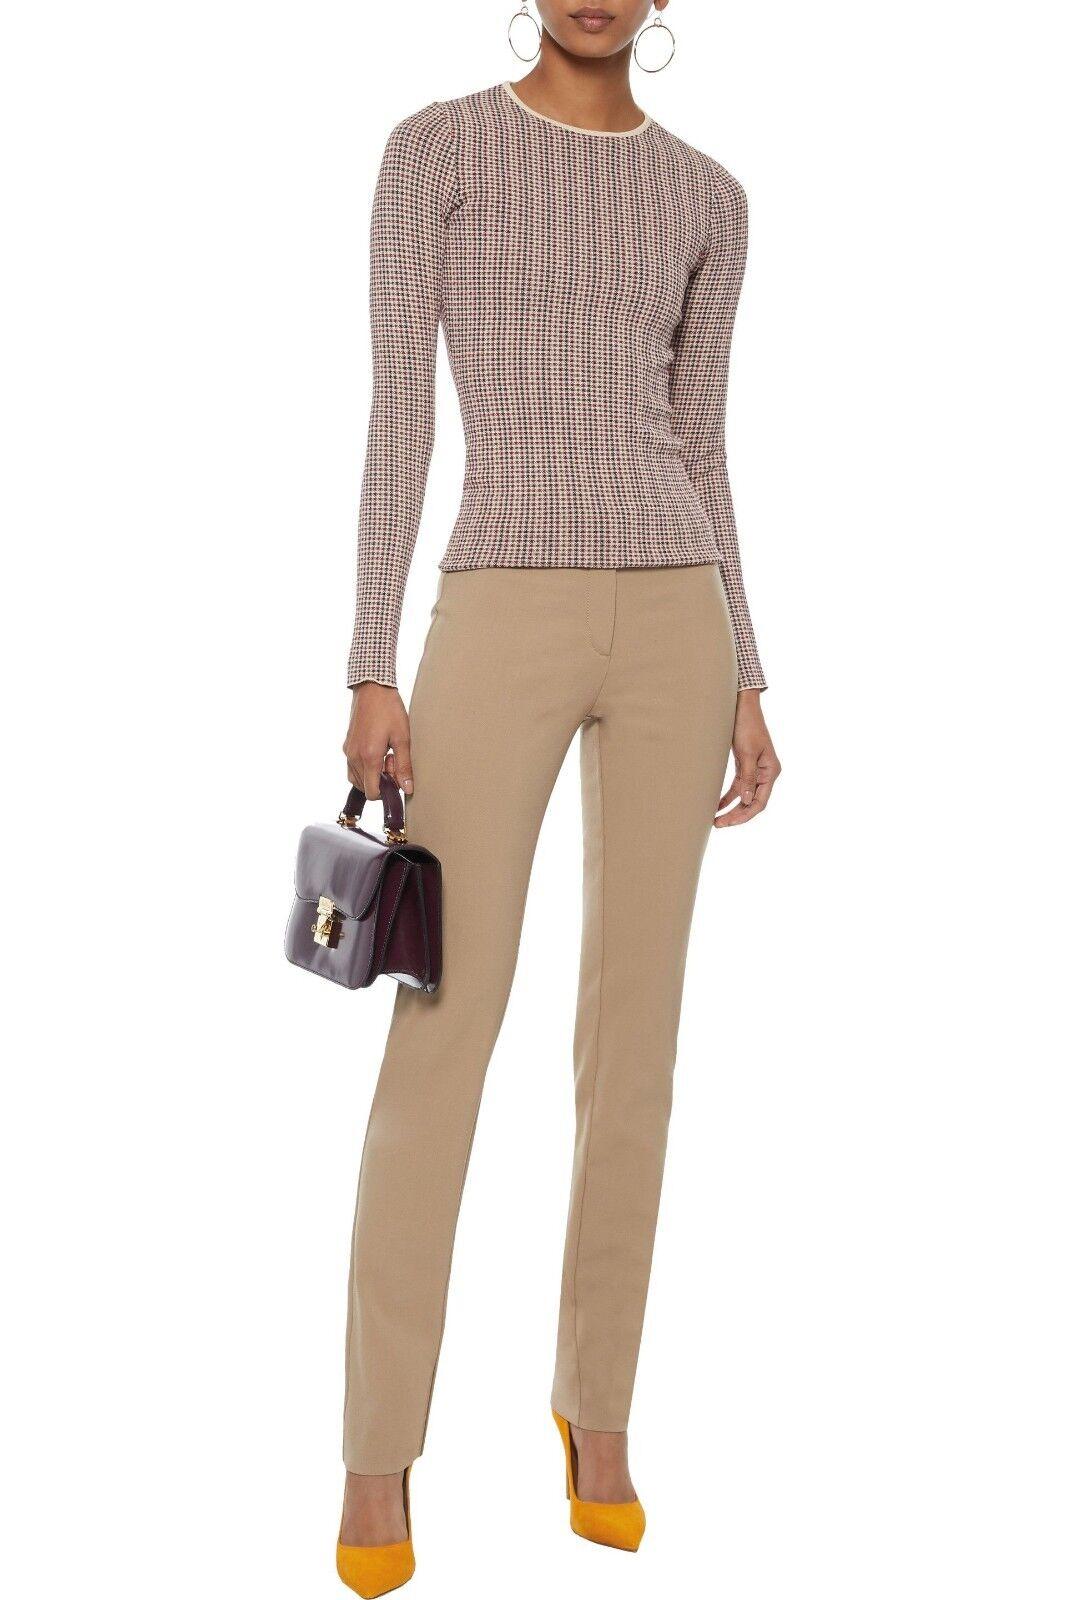 Derek Lam Hanne wool-blend twill slim-leg pants in Camel sz.36 (US 0) NWT